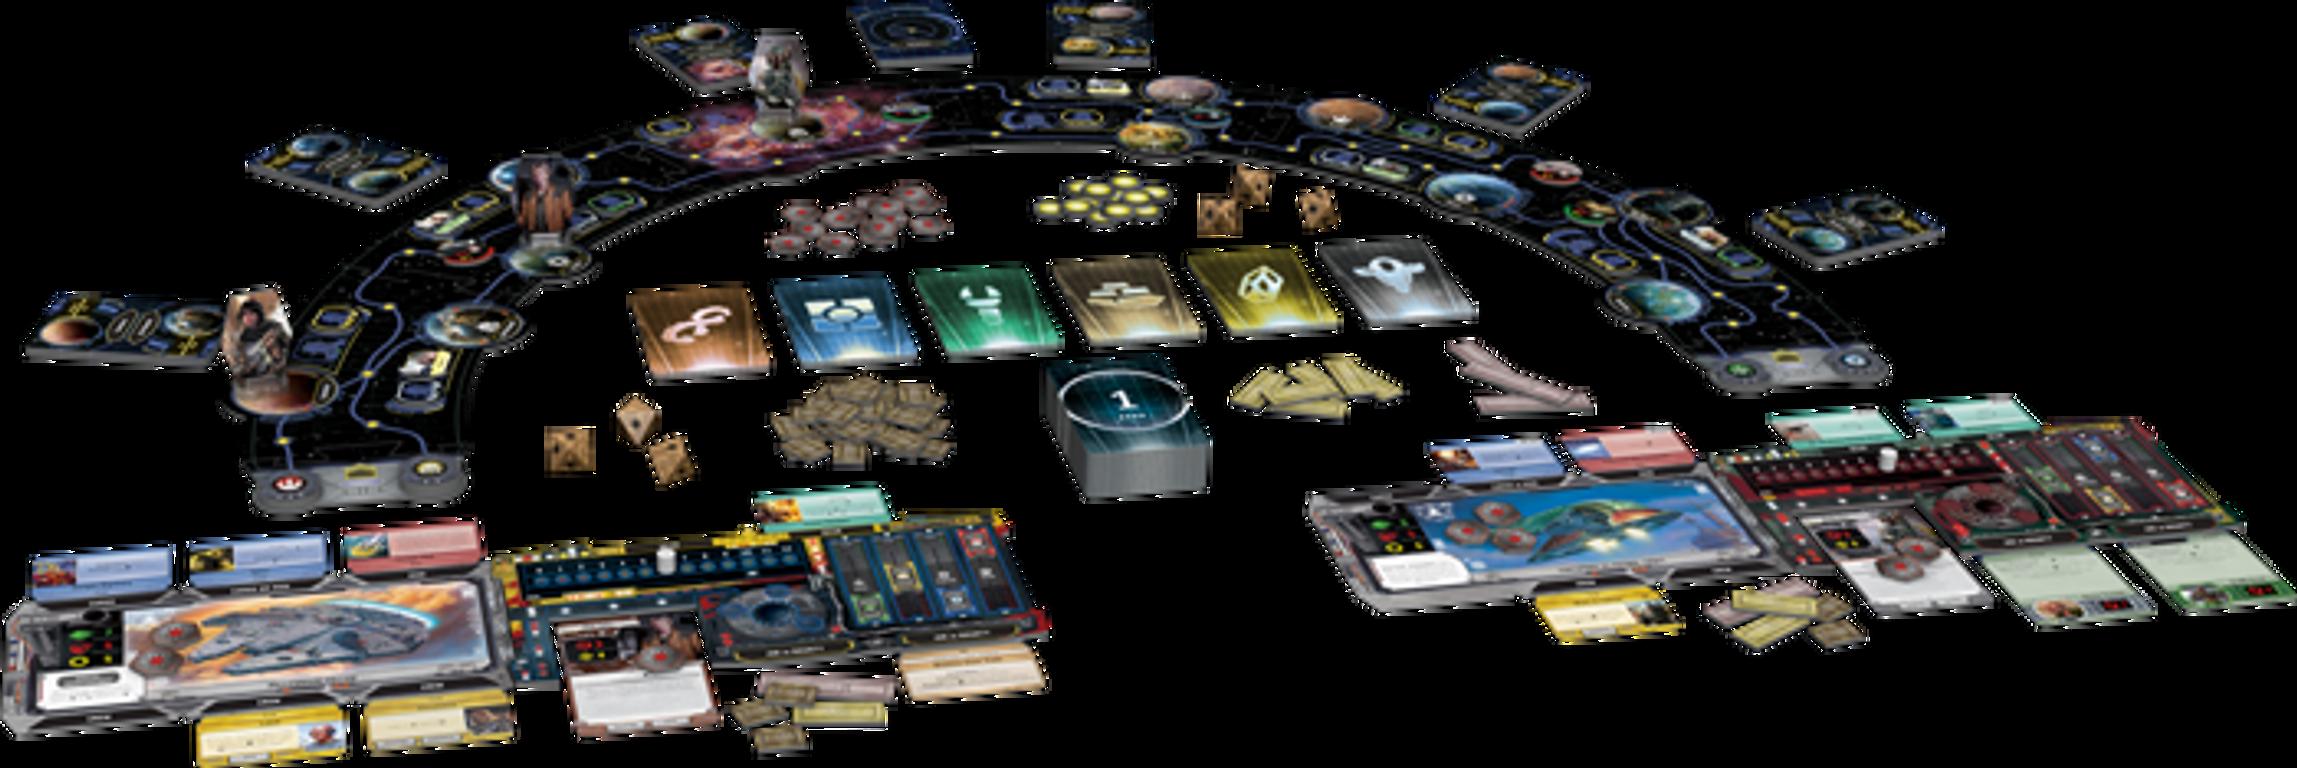 Star+Wars%3A+Outer+Rim+%5Btrans.components%5D